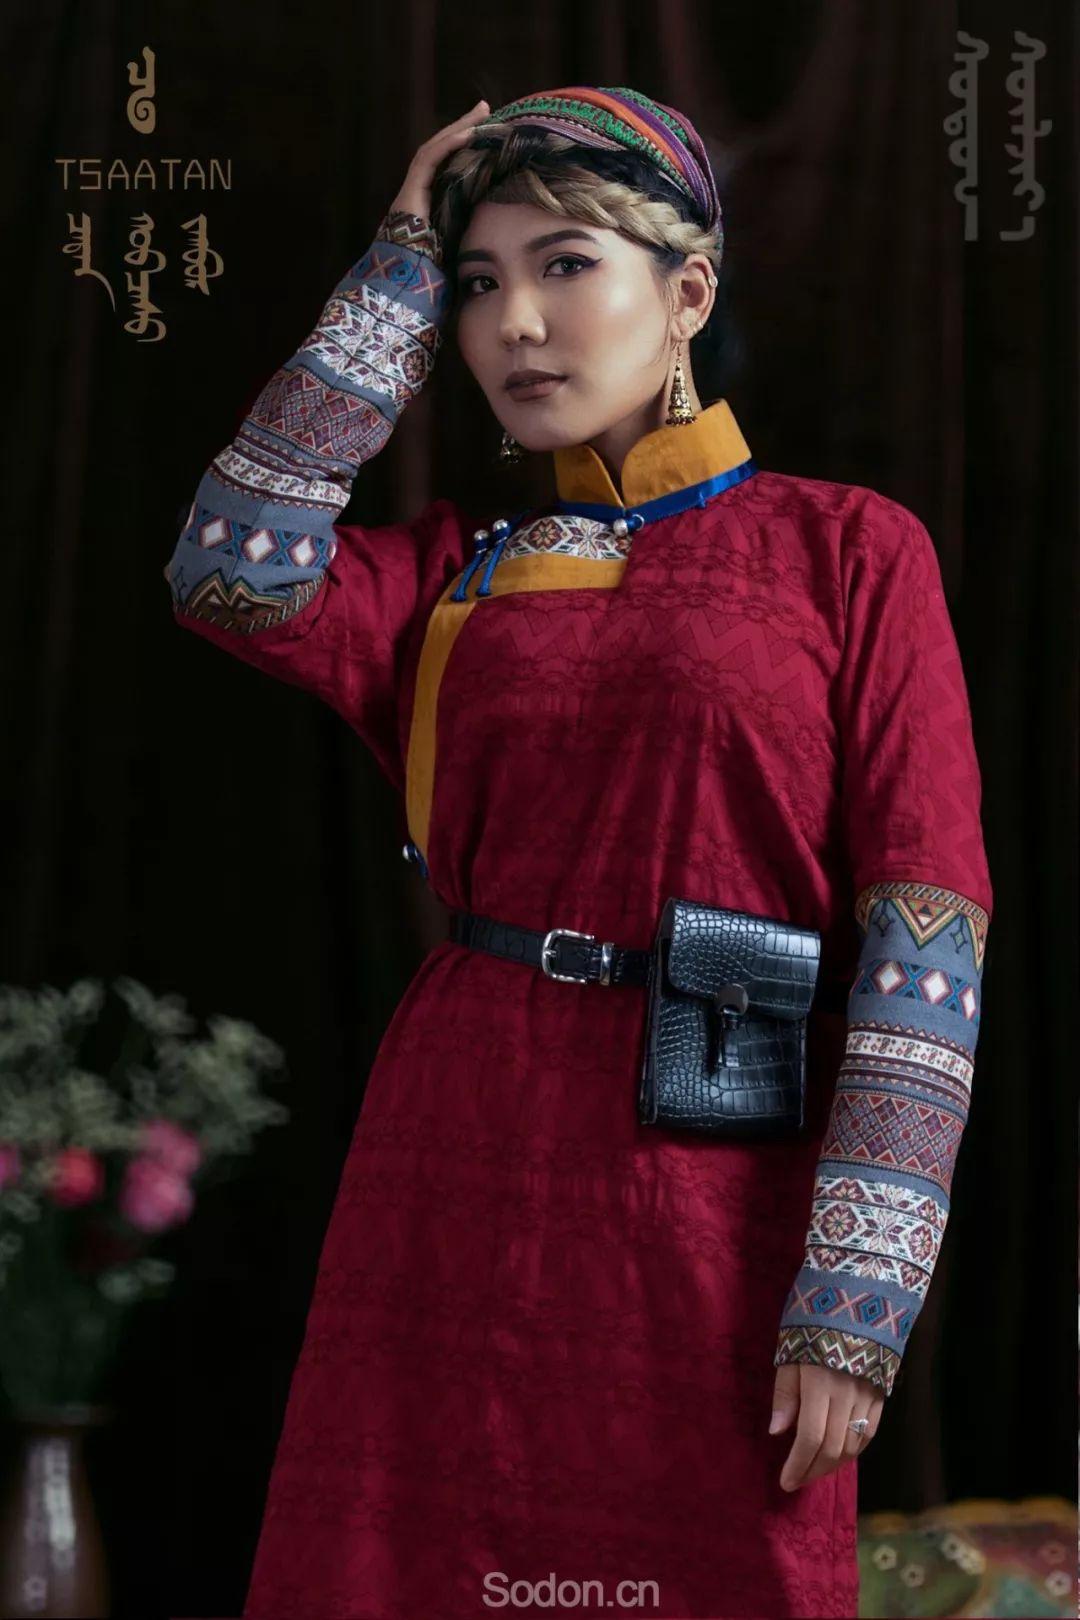 TSAATAN蒙古时装 2019夏季新款首发 第54张